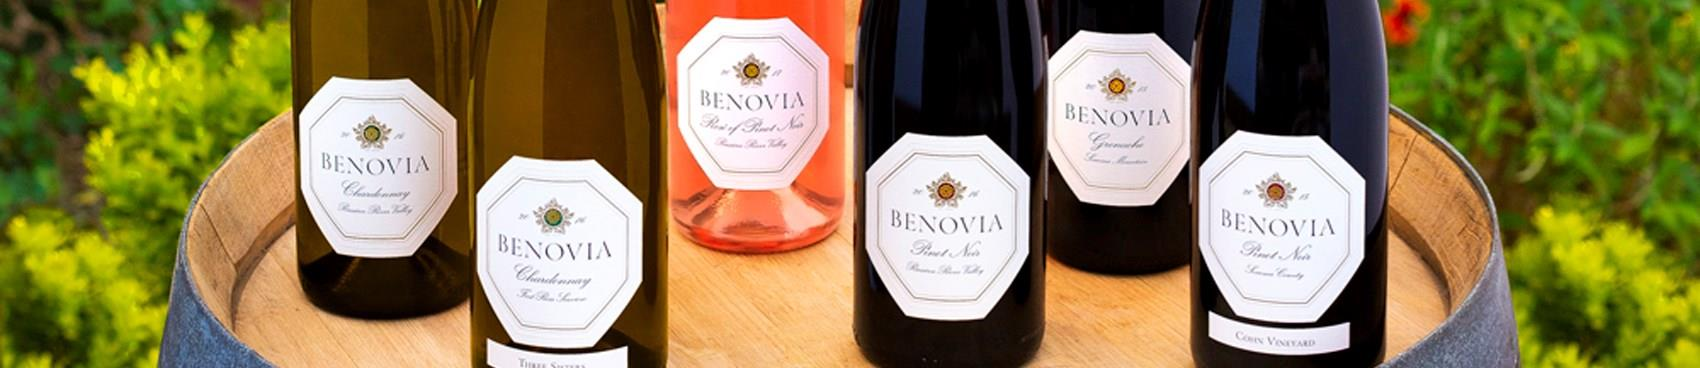 2020 Spring Release Celebration at Benovia Winery